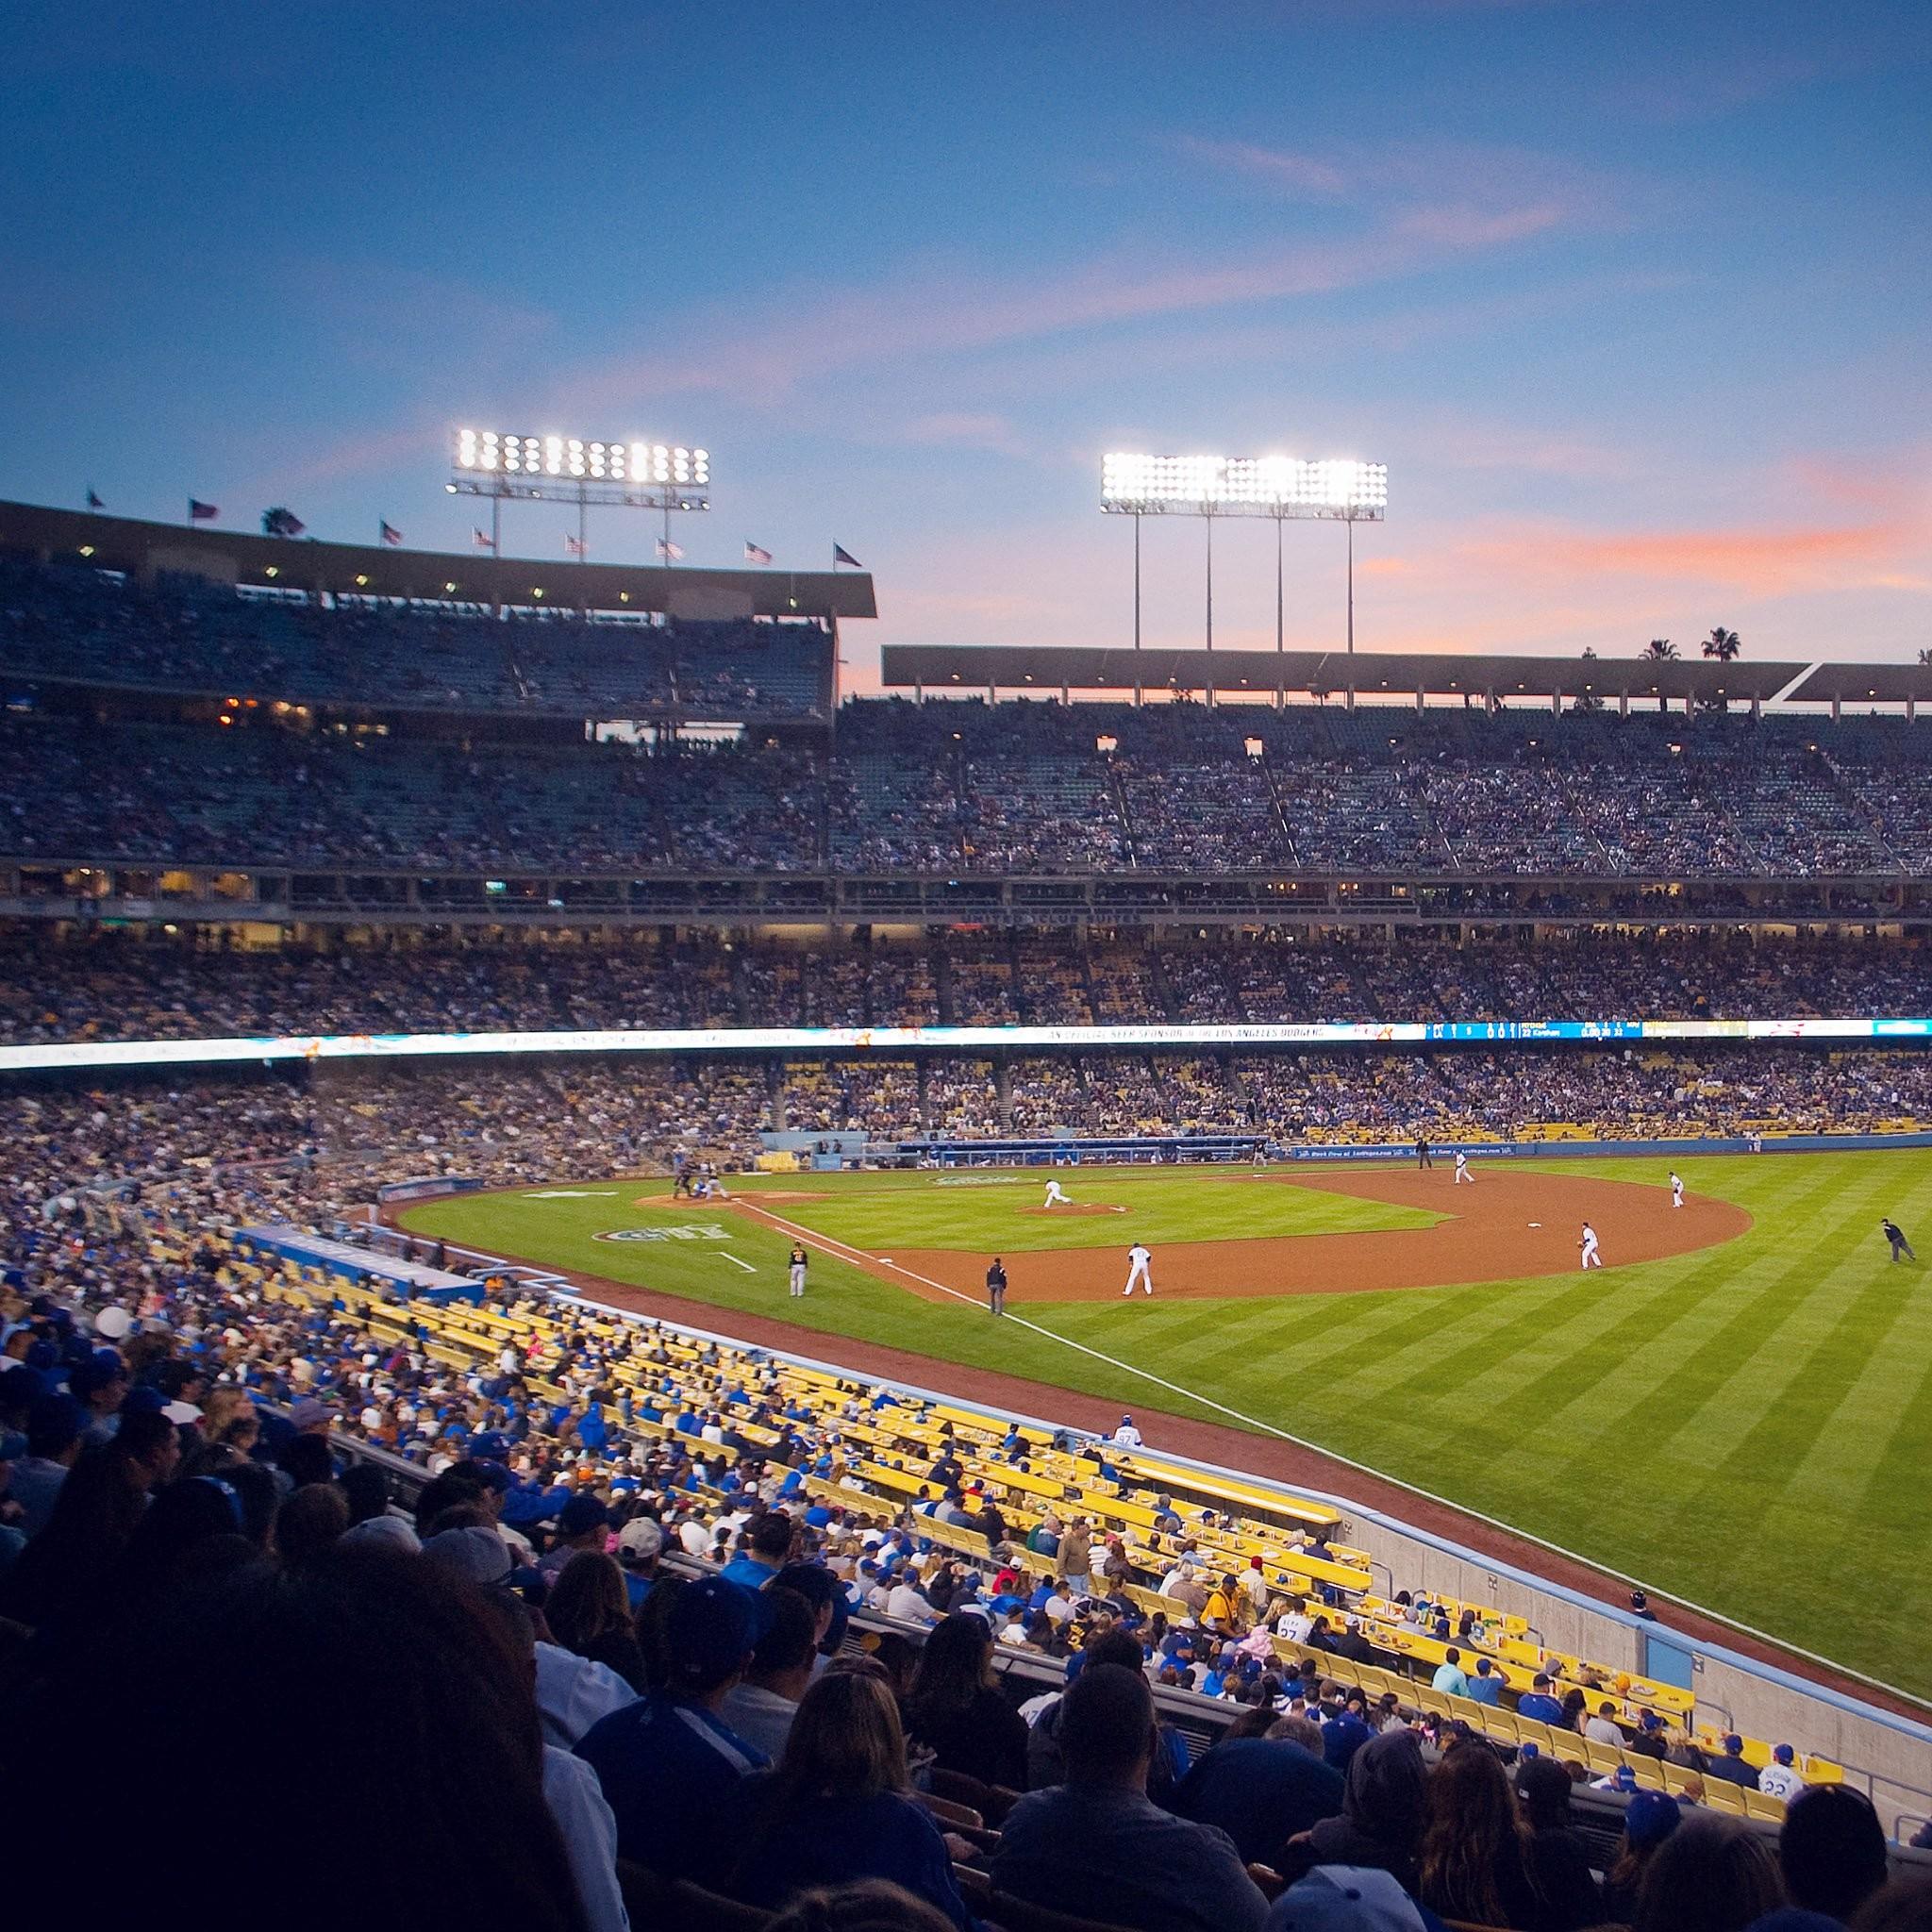 … freeios7 la dodgers stadium parallax hd iphone ipad wallpaper; los  angeles dodgers baseball …